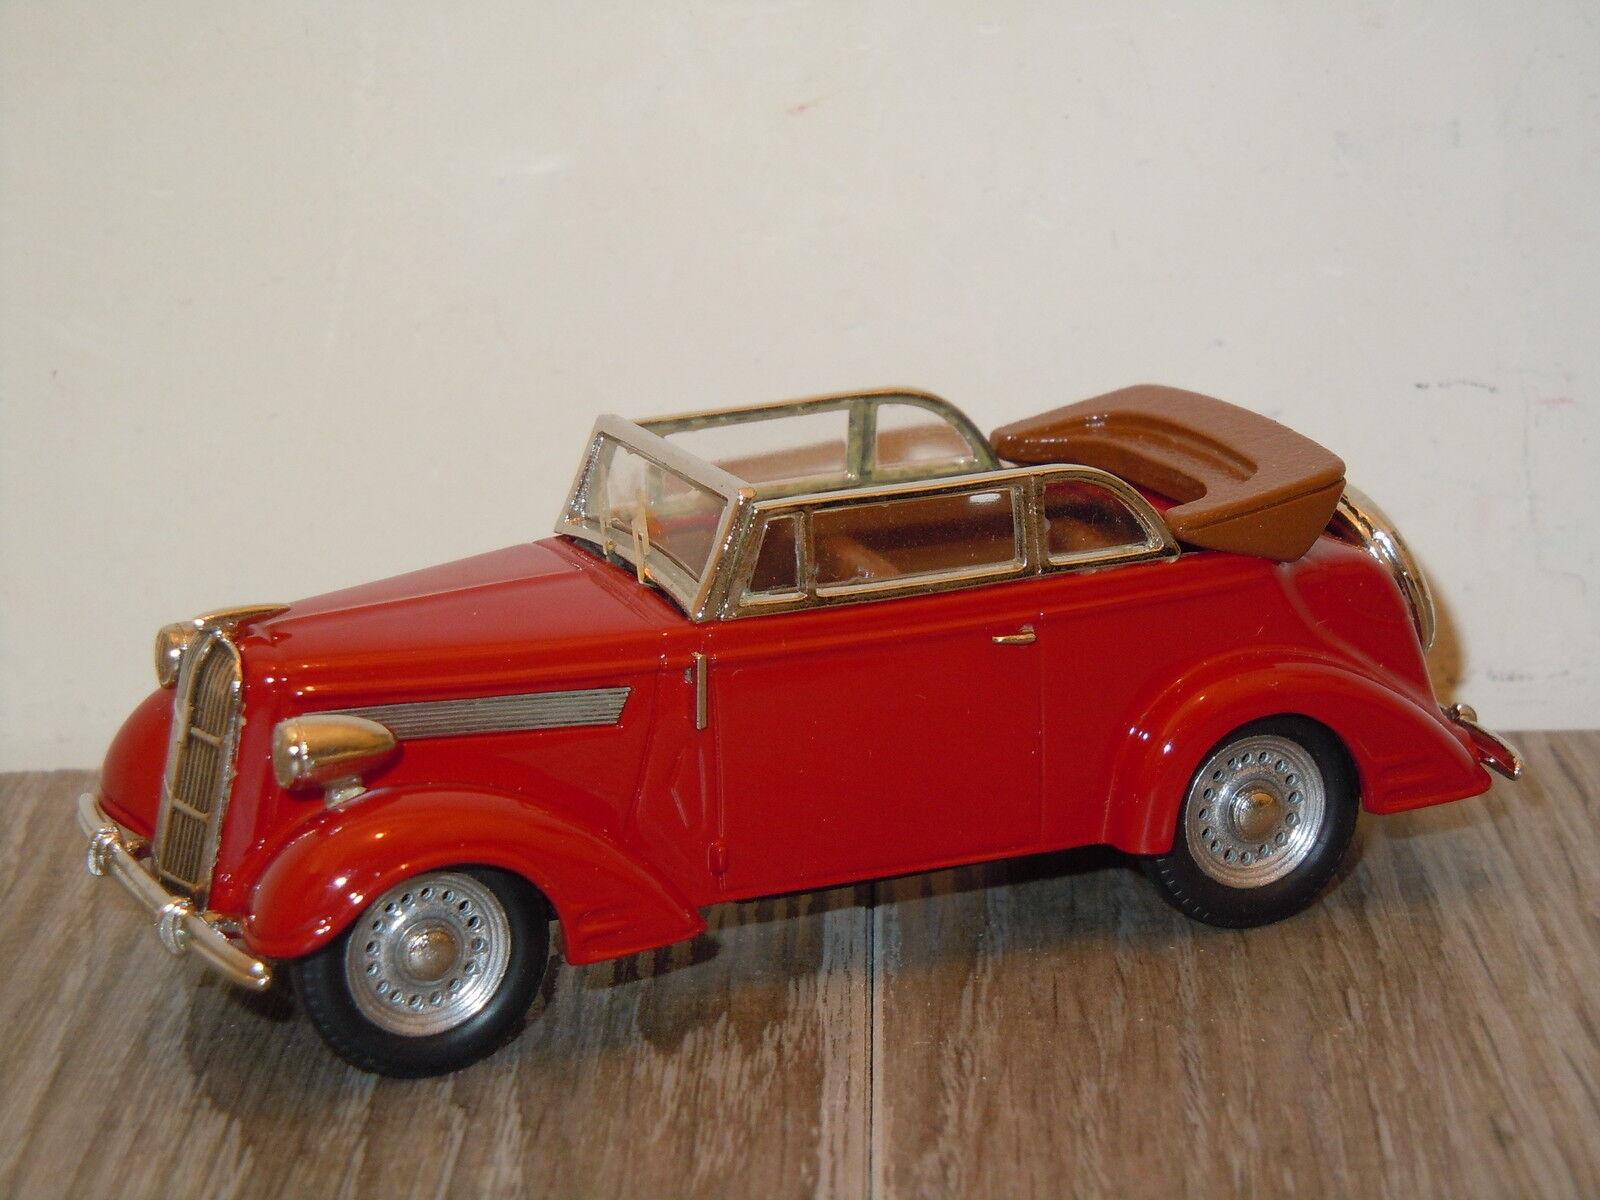 Opel Super 6 Cabriolet van Tin Wizard 3101 1 43 in Box 10701